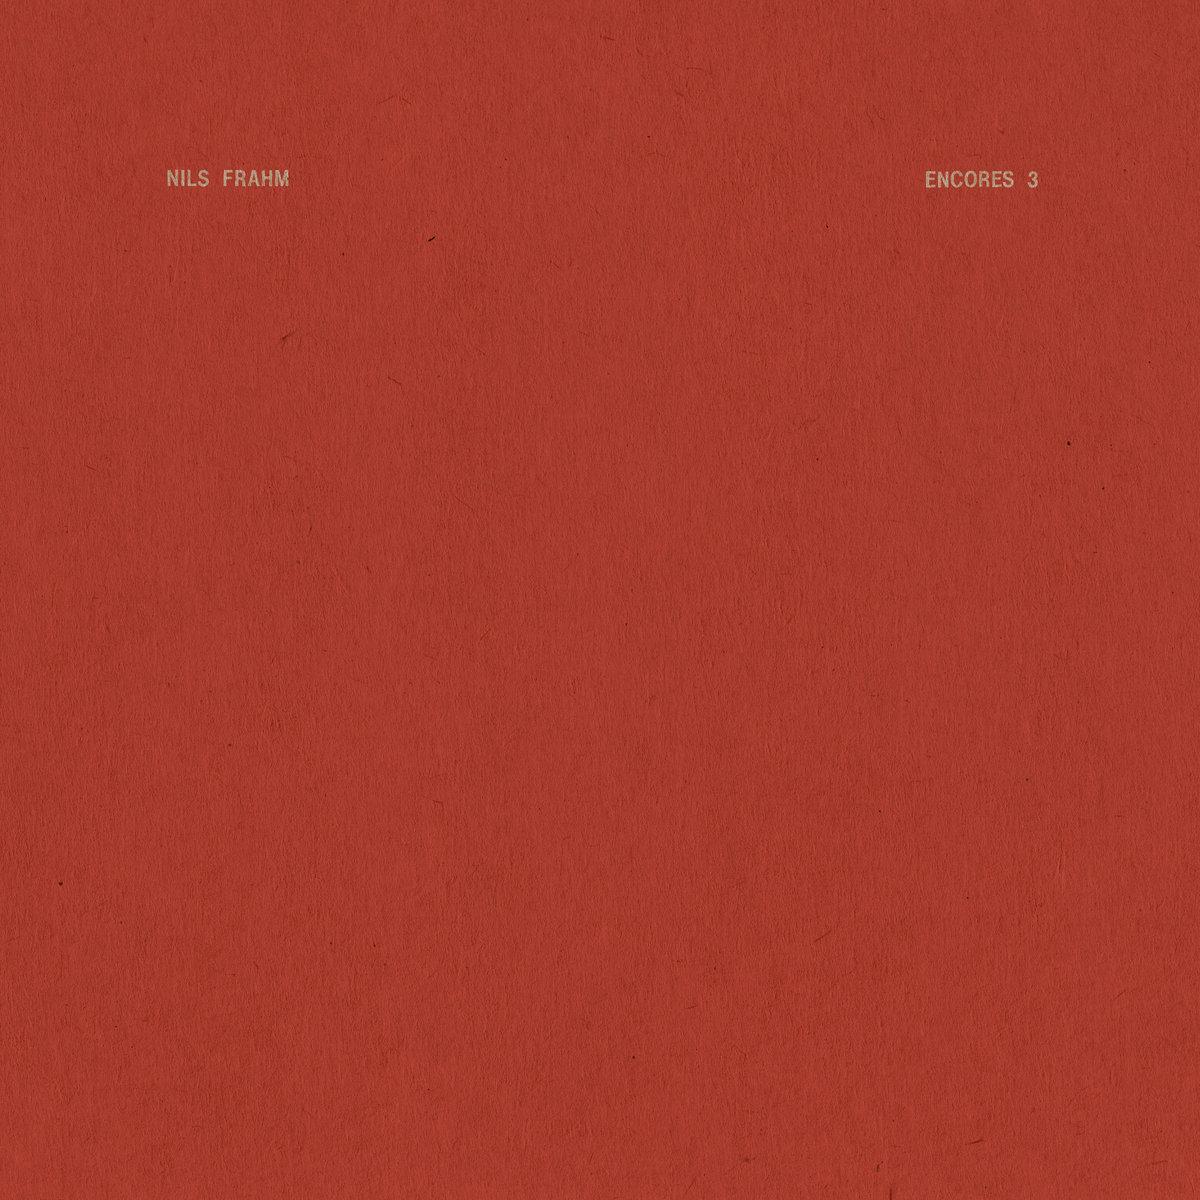 Nils Frahm Encores 3 EP cover artwork